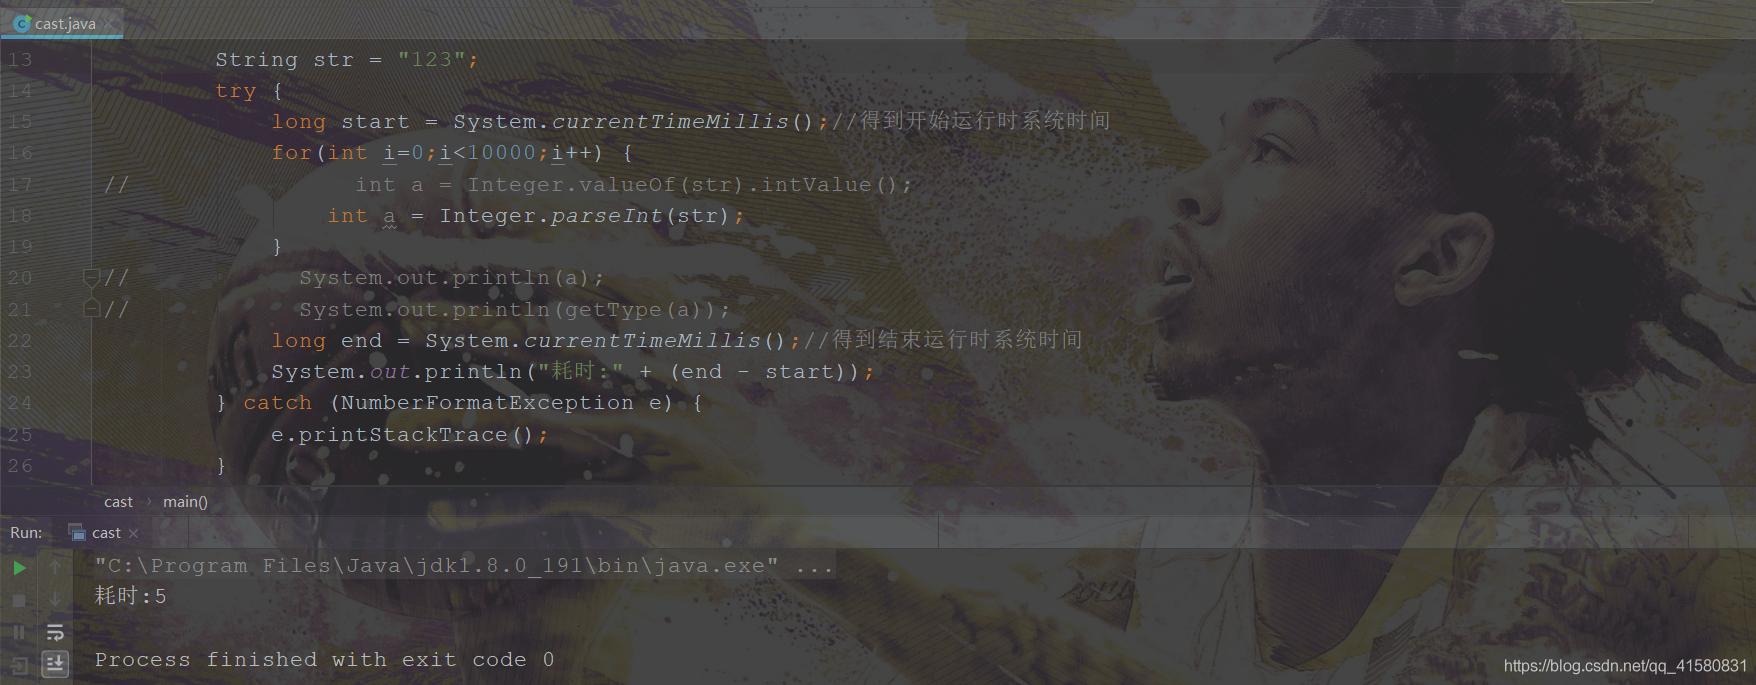 ](https://img-blog.csdnimg.cn/20200116150120413.png?x-oss-process=image/watermark,type_ZmFuZ3poZW5naGVpdGk,shadow_10,text_aHR0cHM6Ly9ibG9nLmNzZG4ubmV0L3FxXzQxNTgwODMx,size_16,color_FFFFFF,t_70)